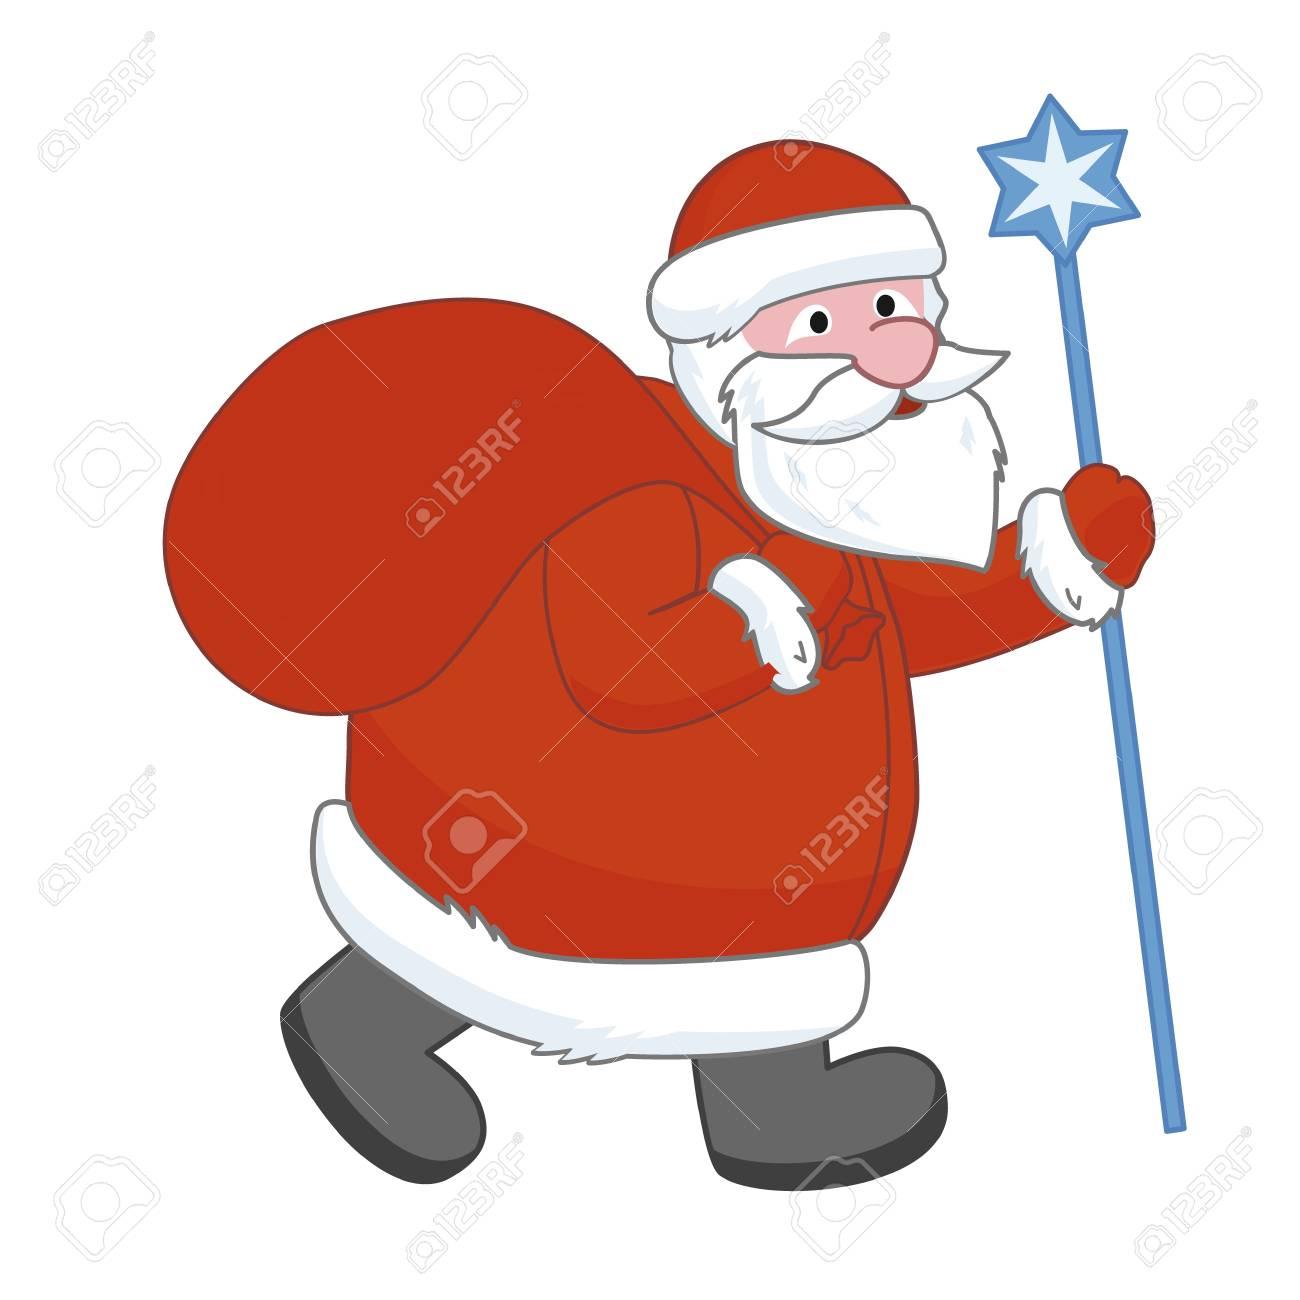 Vector Illustration Of Funny Cartoon Santa Claus Rides With Big